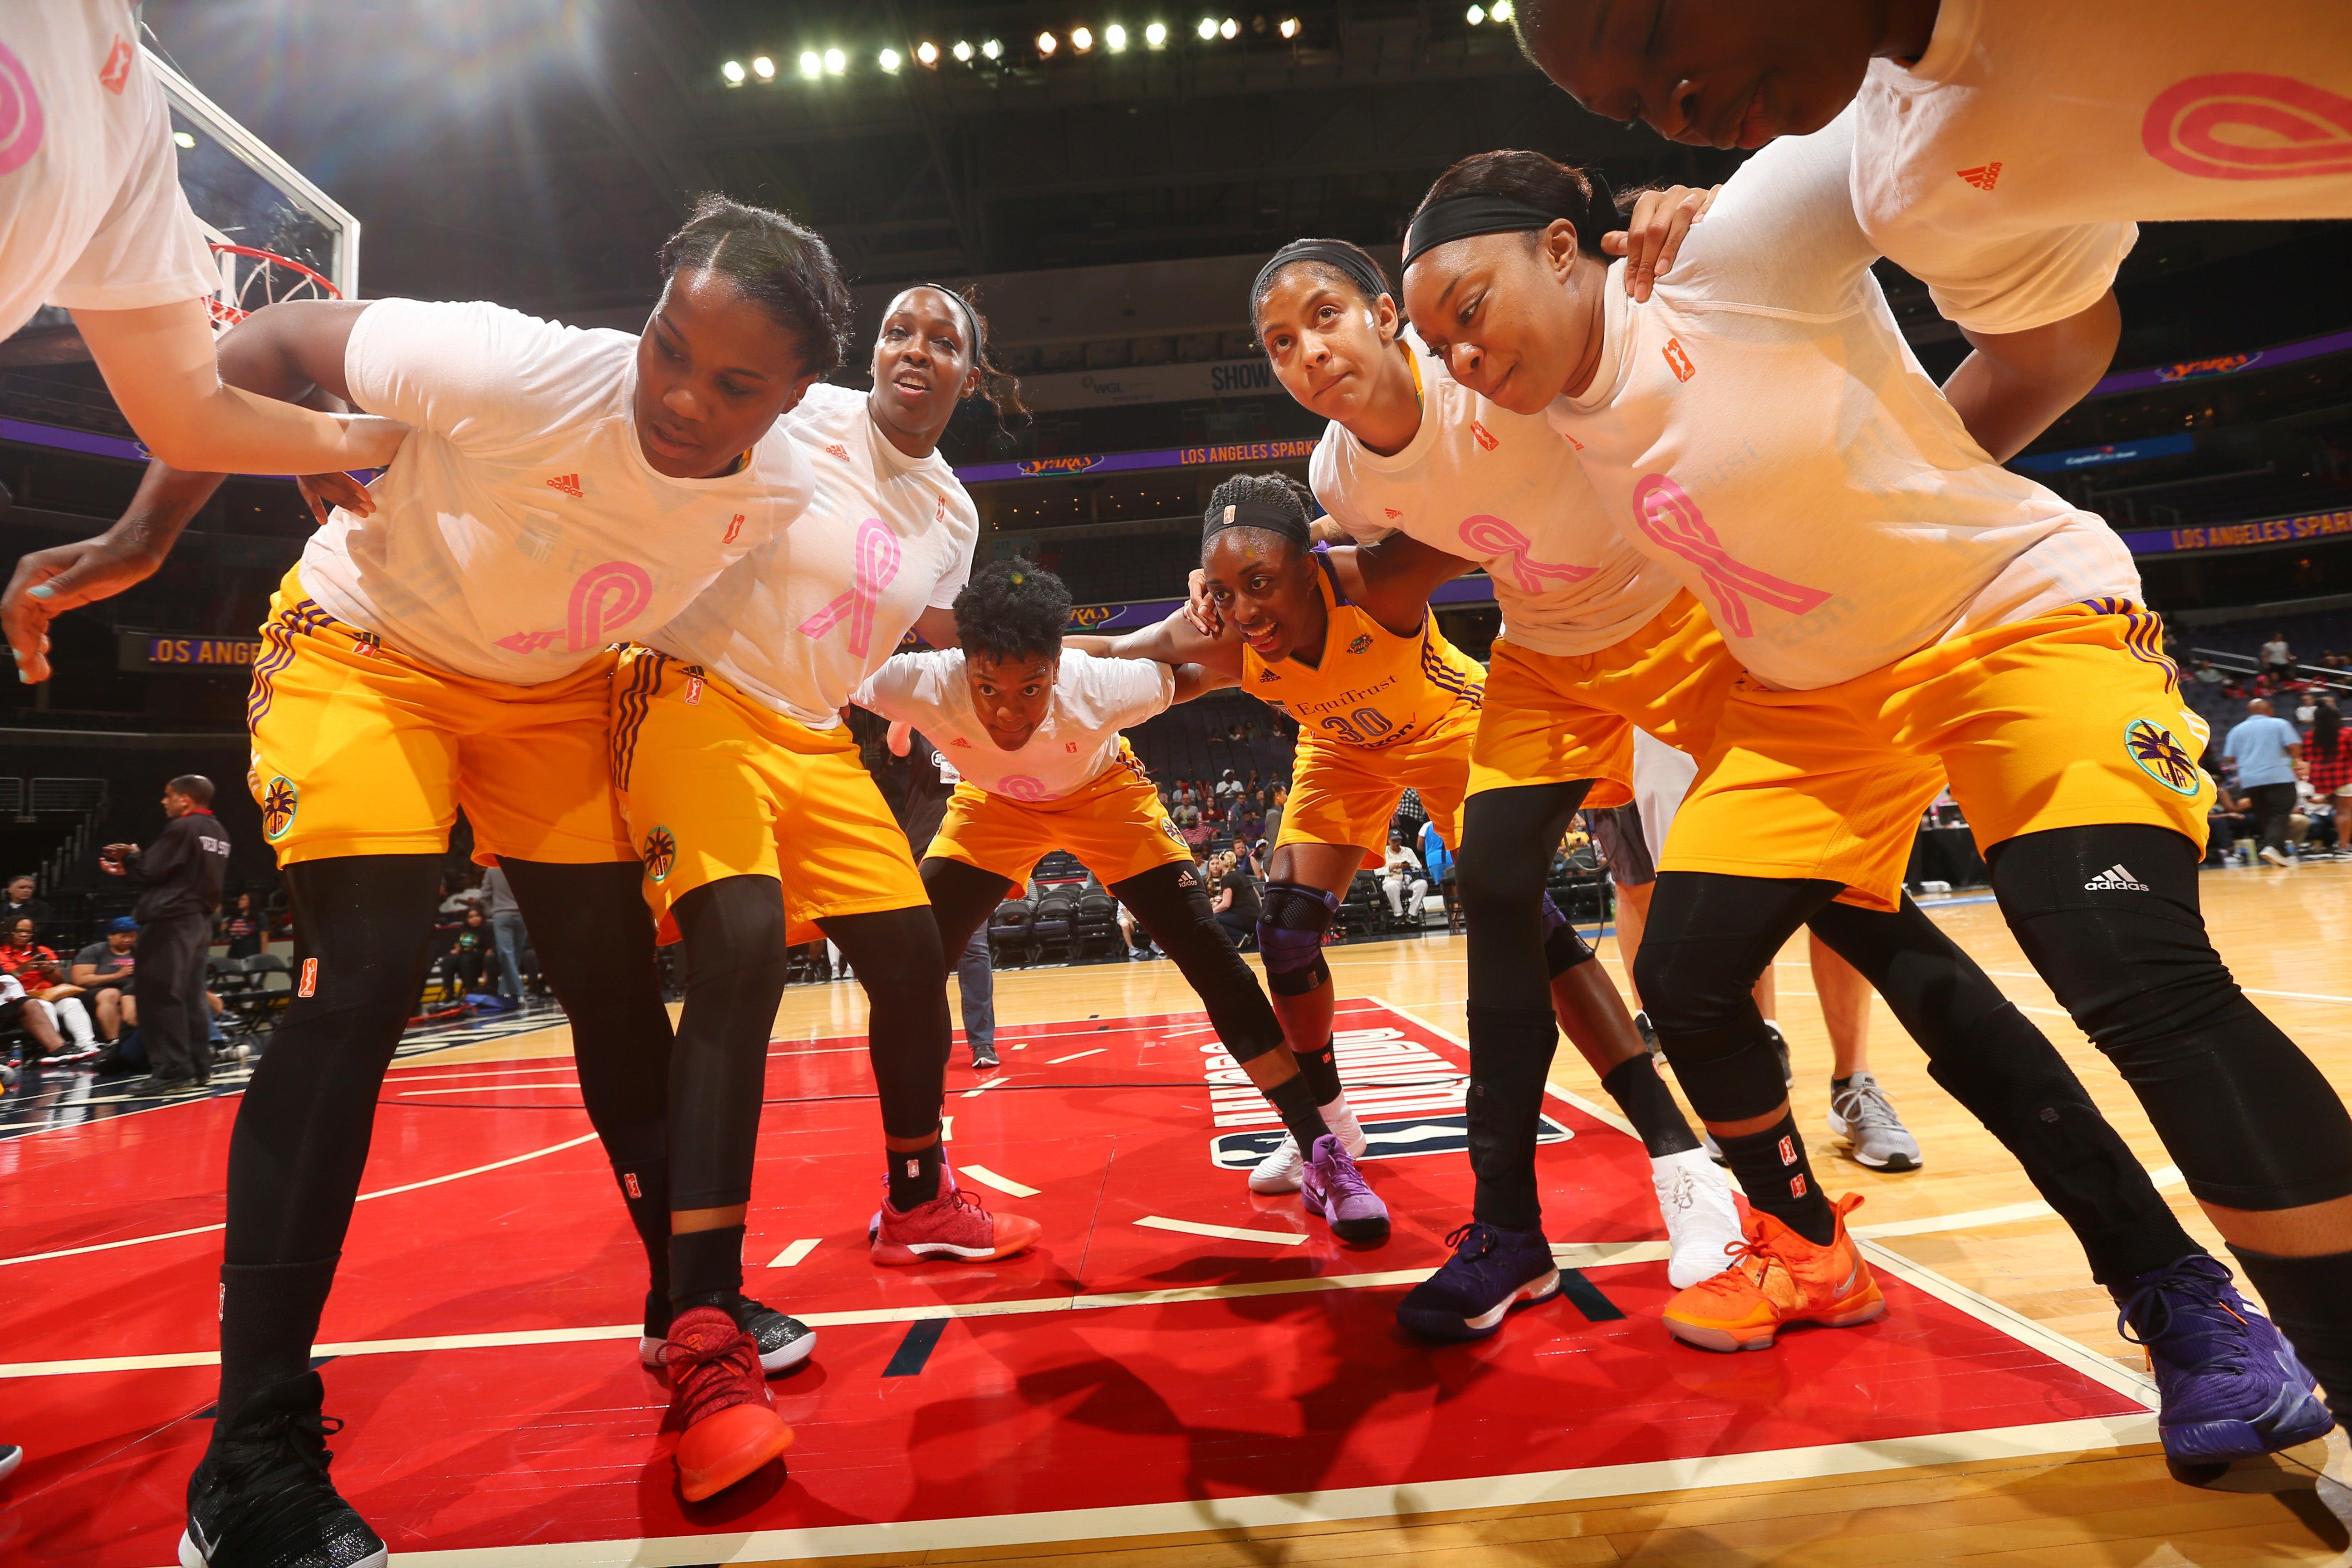 WNBA Teams Unite For National Anthem Protest After White Supremacist Violence In Charlottesville